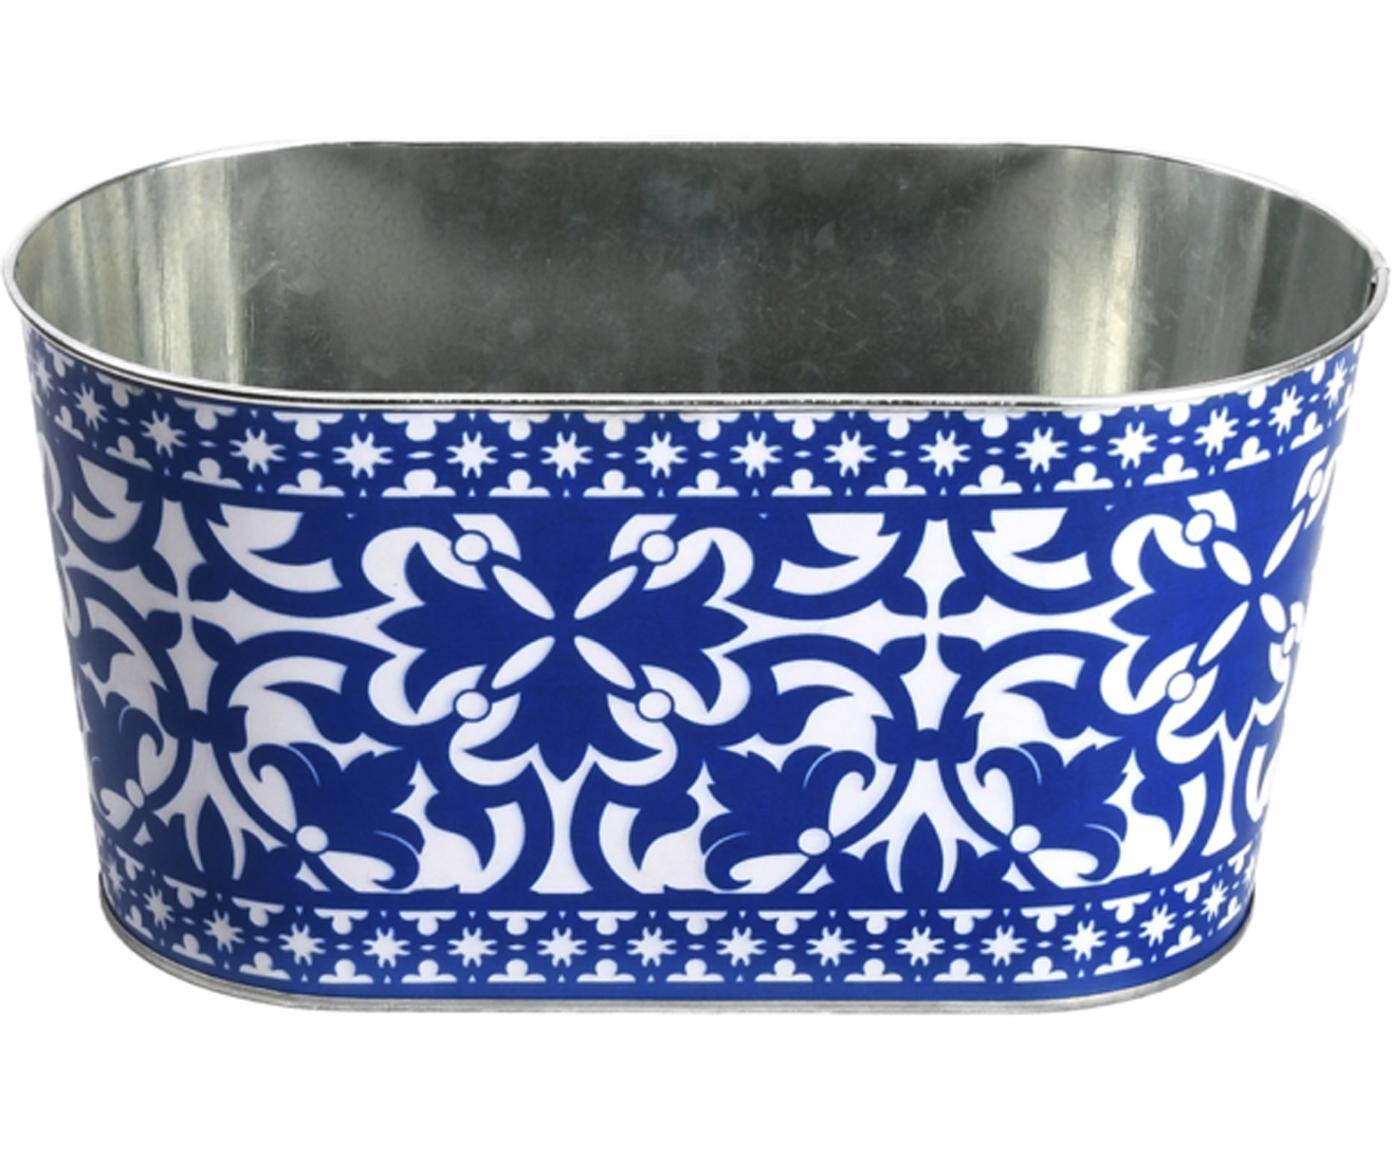 Macetero Barcelona, Metal, Azul, blanco, An 23 x Al 12 cm